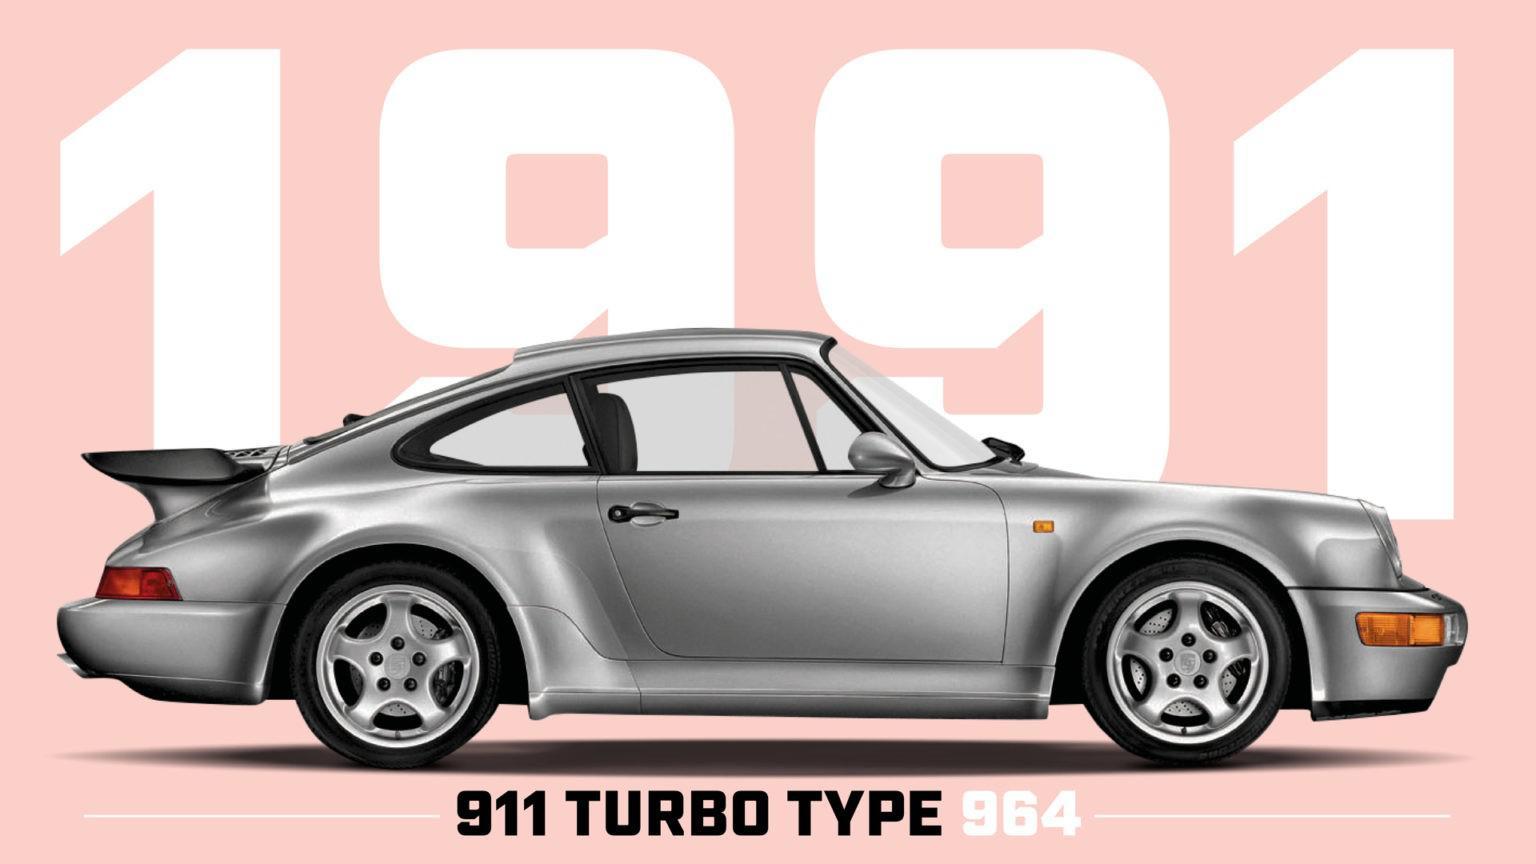 la-saga-porsche-911-turbo-le-guide-d-achat-1349-2.jpg